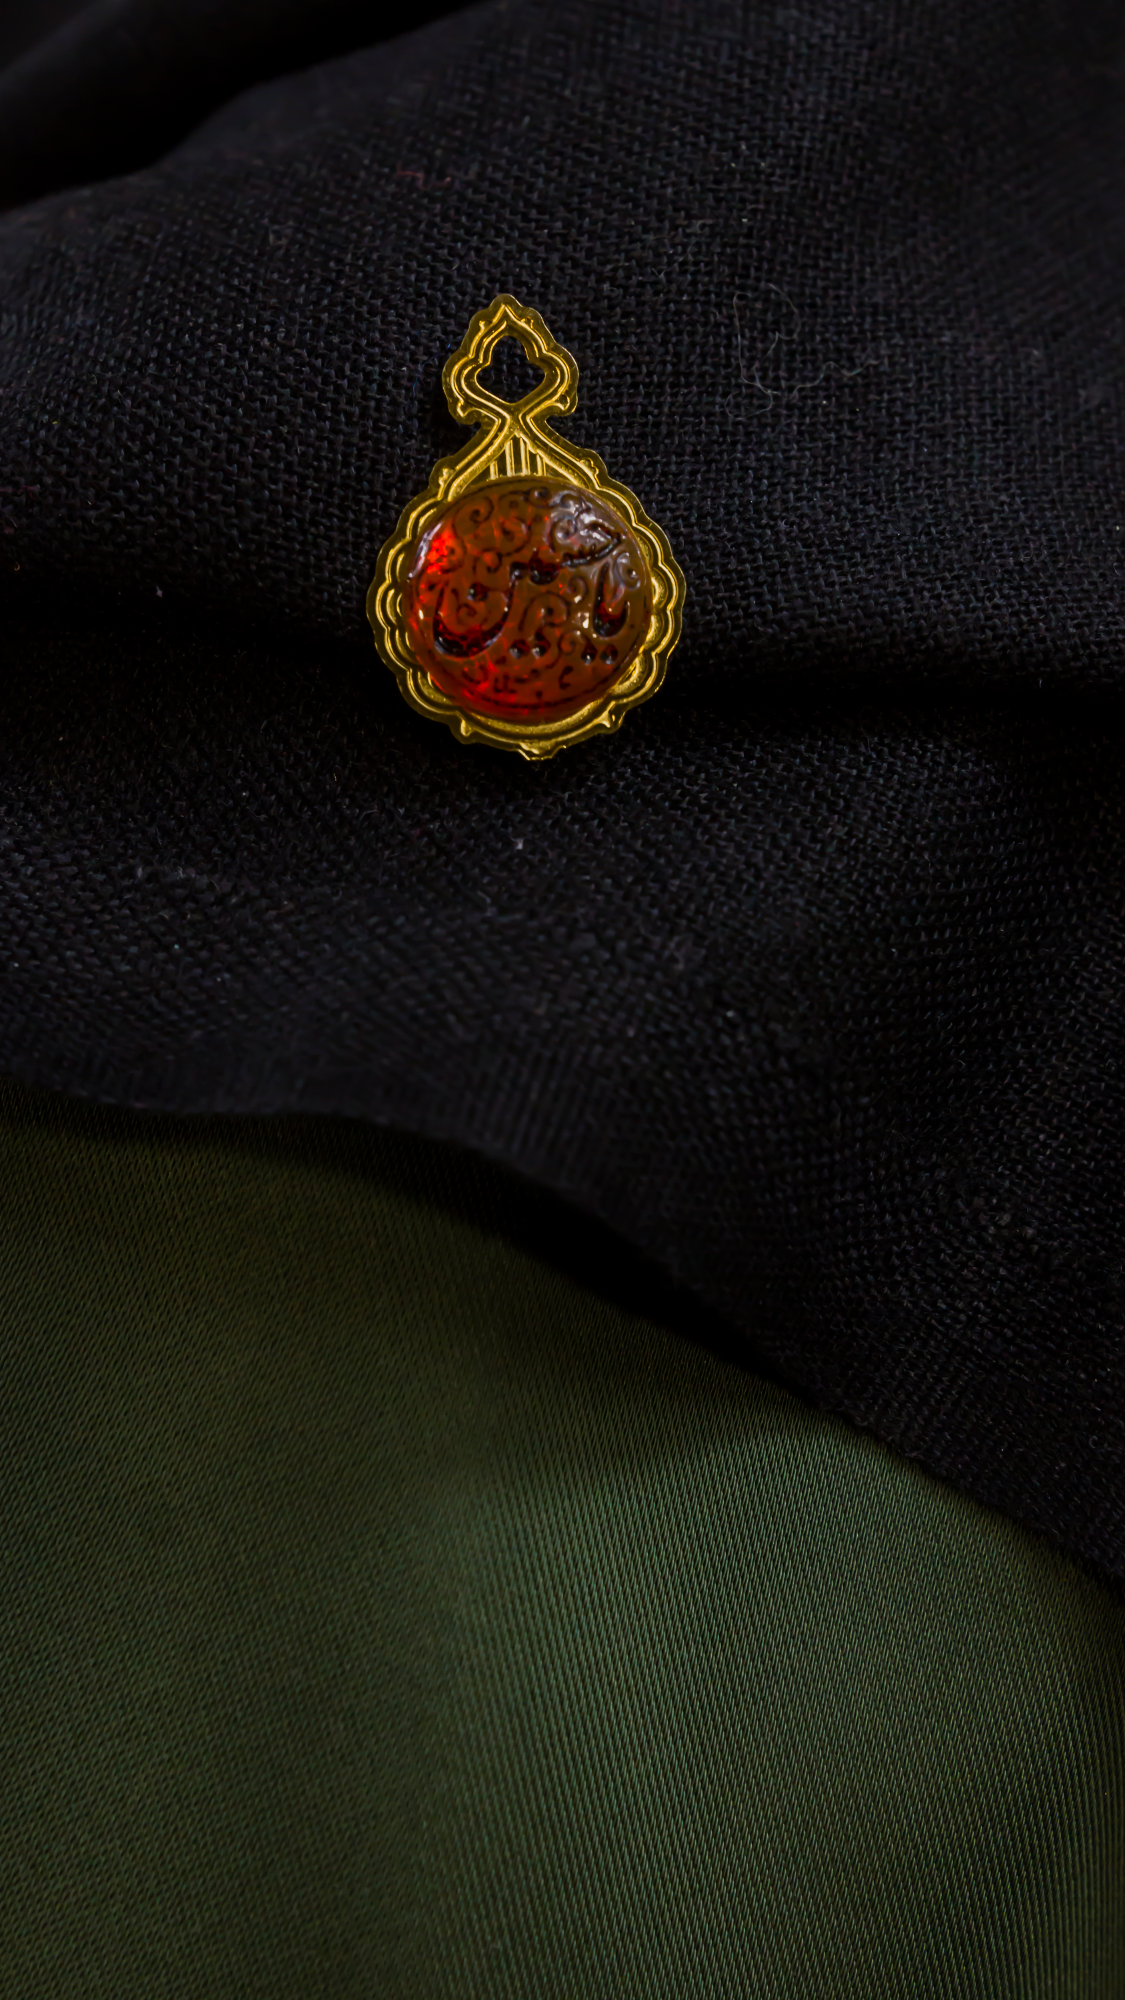 Ya Hossein Purity pin